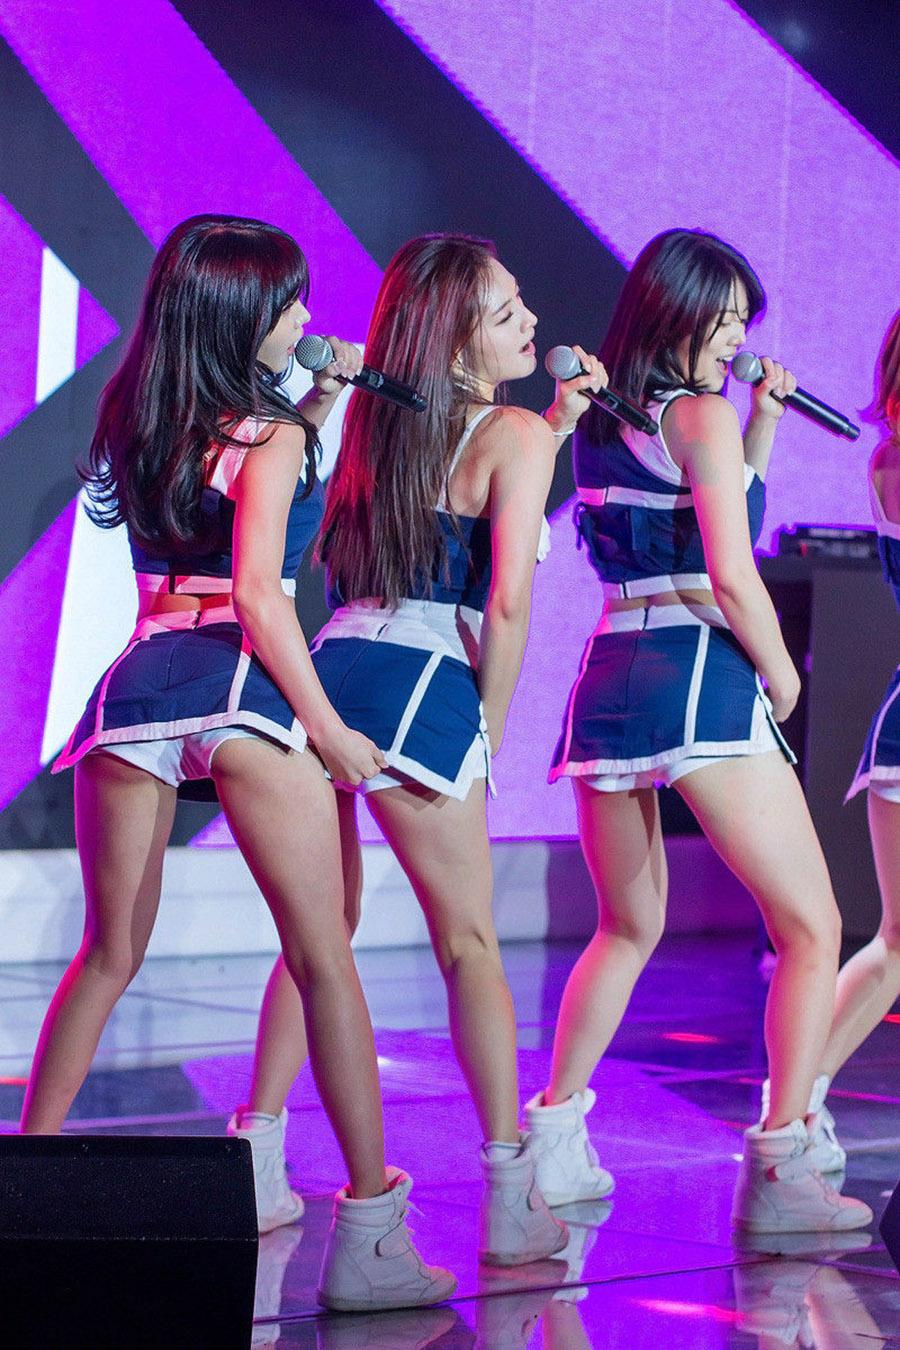 K-POP韓国女性あいどるのコンサート行ったらむらむらしてトイレ駆け込んでしまいそうwwwwwwwwww(写真あり)